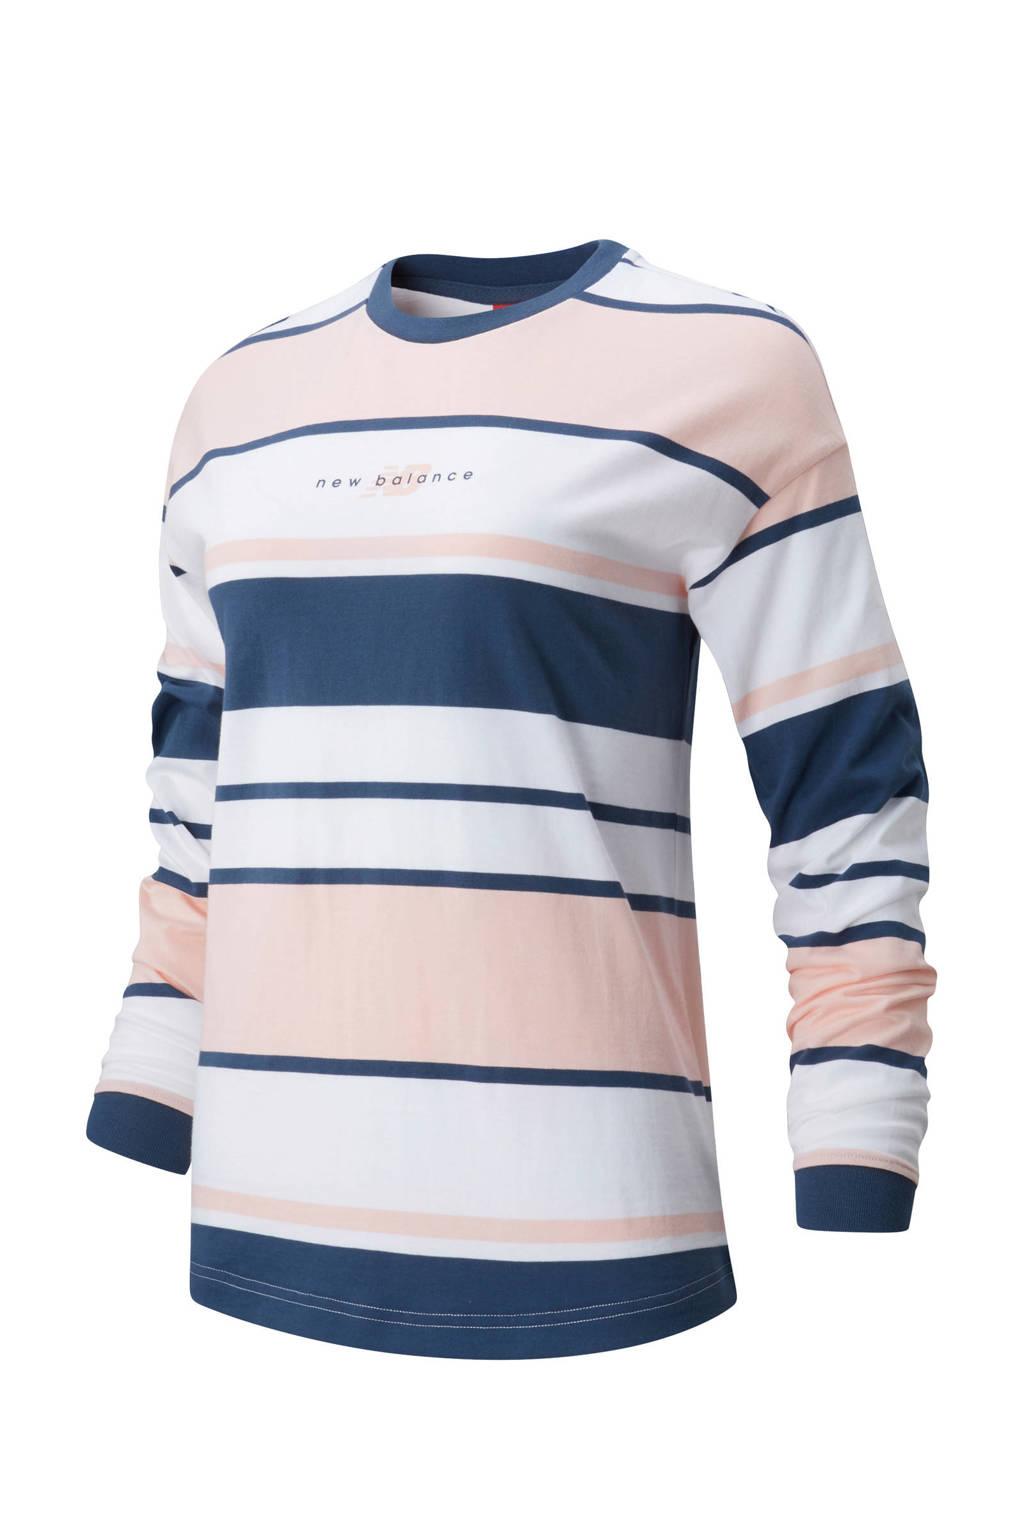 New Balance T-shirt donkerblauw/oranje/wit, Donkerblauw/oranje/wit